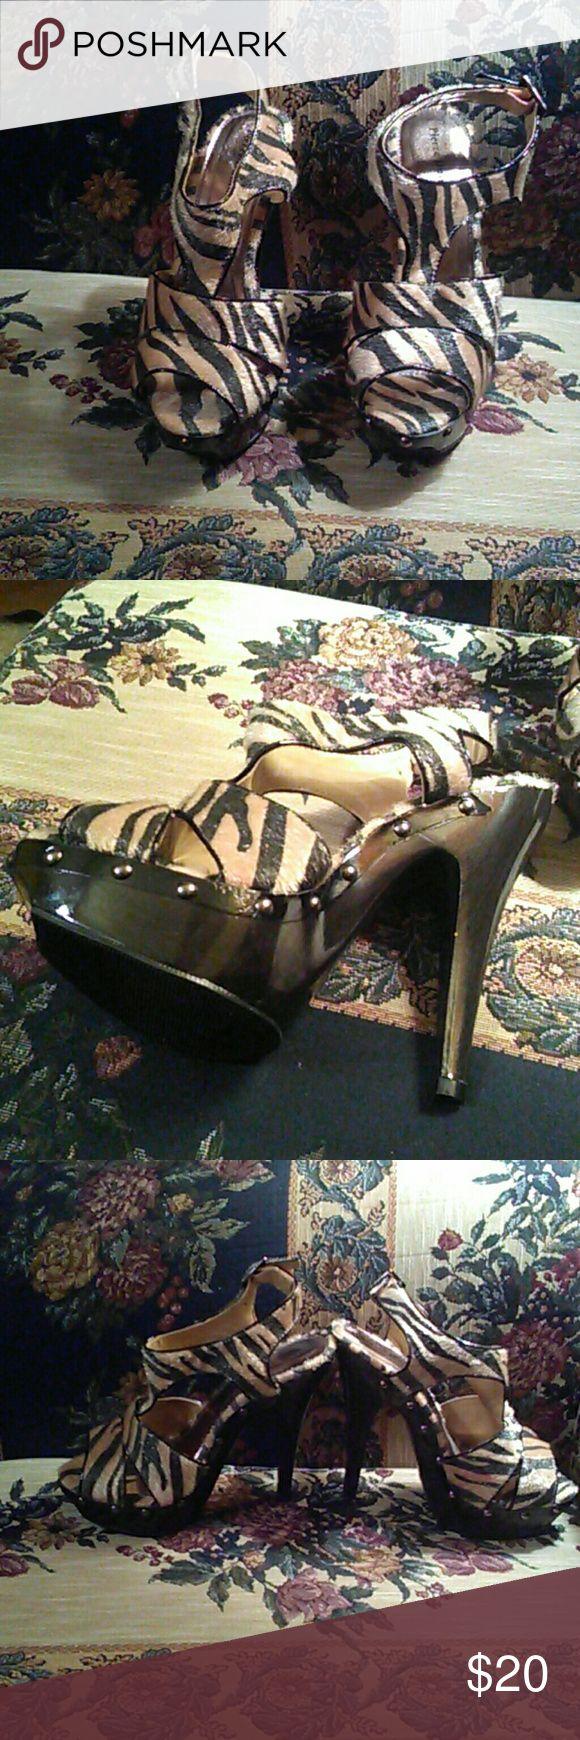 Pierre dumas size 7 animal print shoes platform. Worn once.  Platform sandals.  Closes at heel with buckle. Pierre Dumas Shoes Platforms